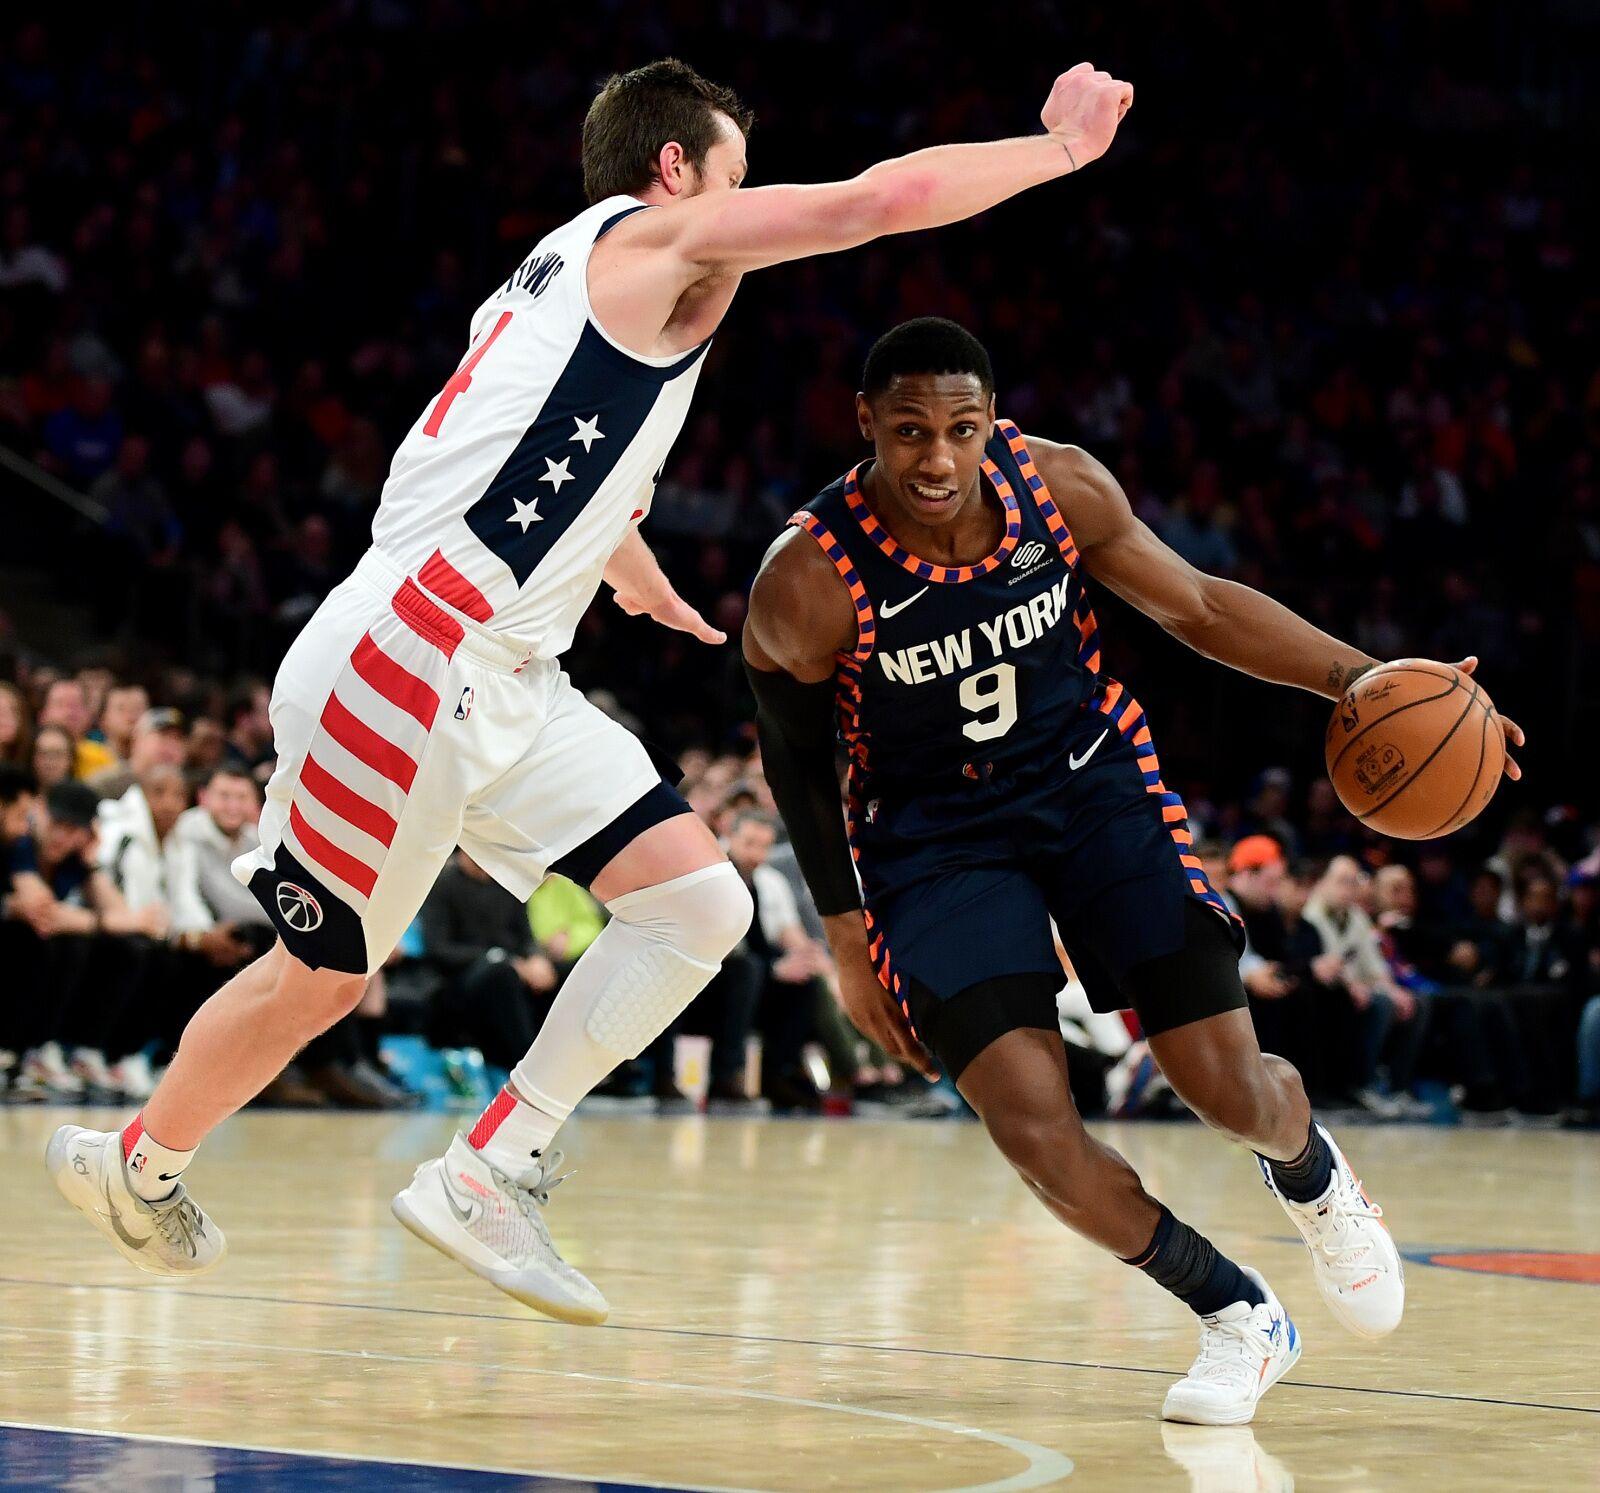 Knicks have plenty of developments last week, but what about player development?